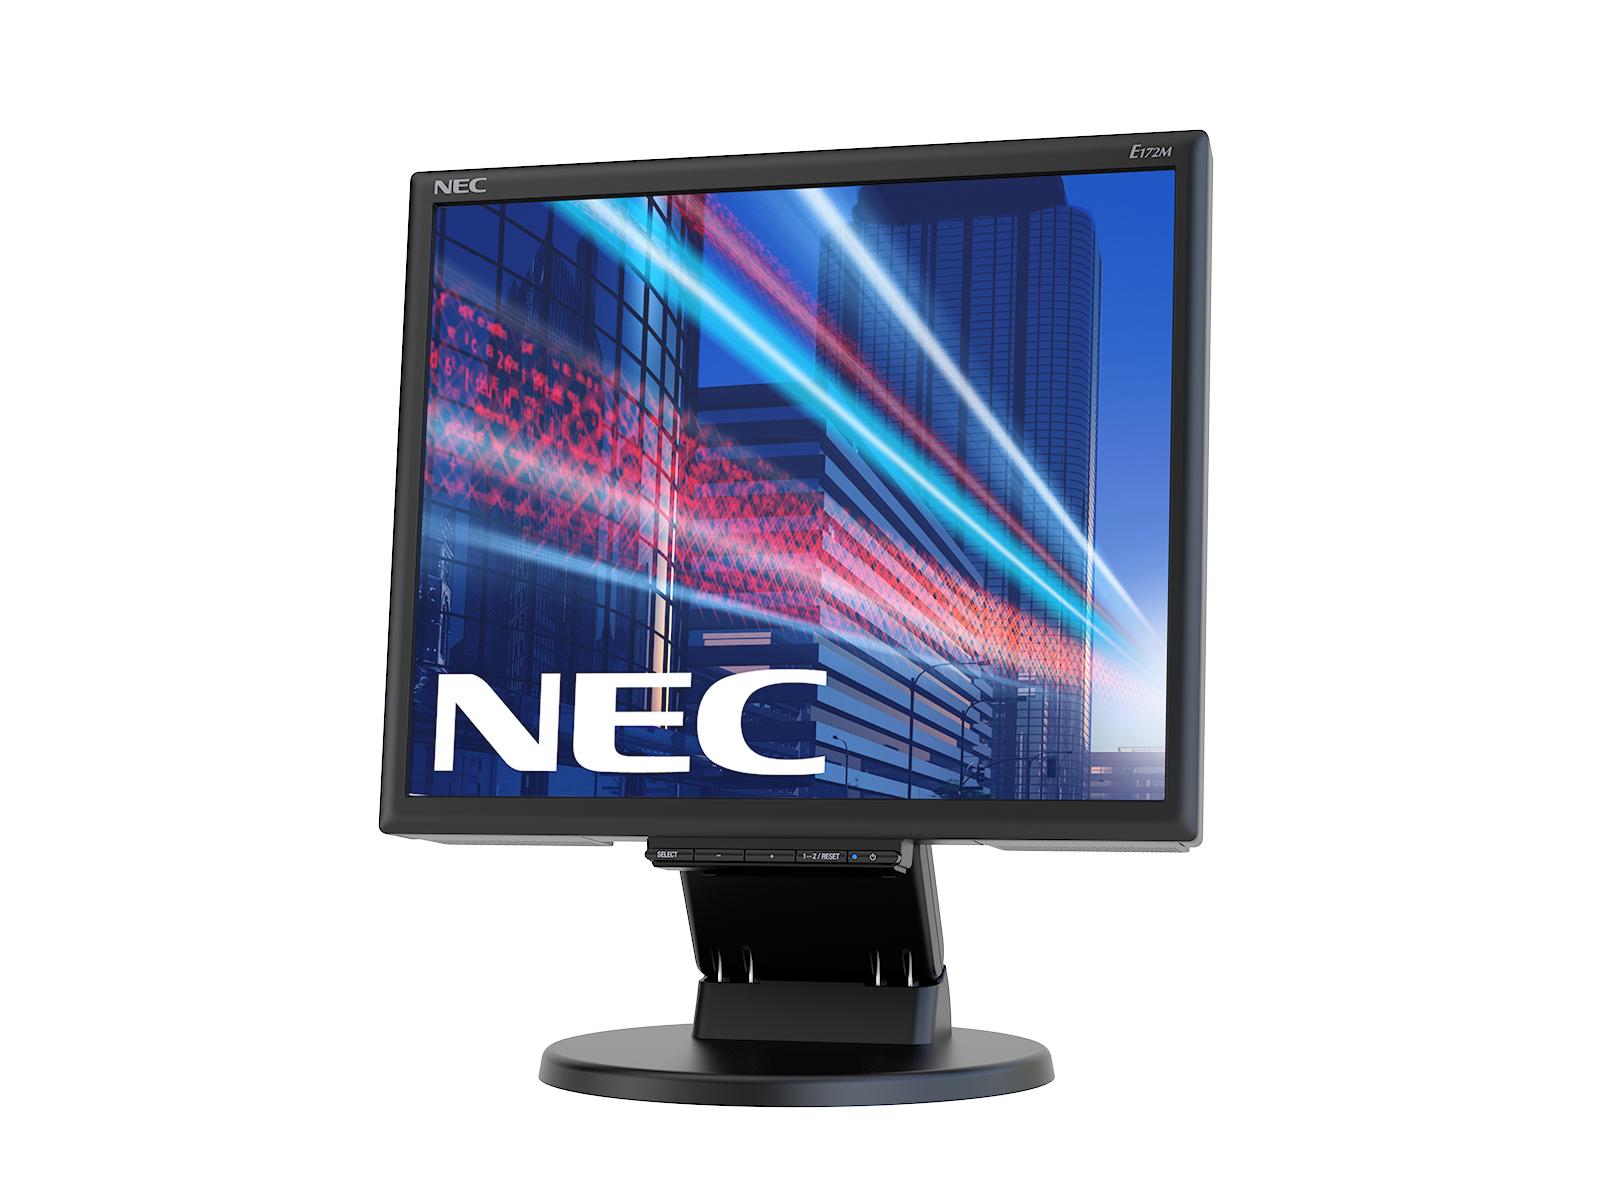 17'' LED NEC V-Touch 1723 5U - 5-žilový, VGA, DP, HDMI, USB - VT1723-5U